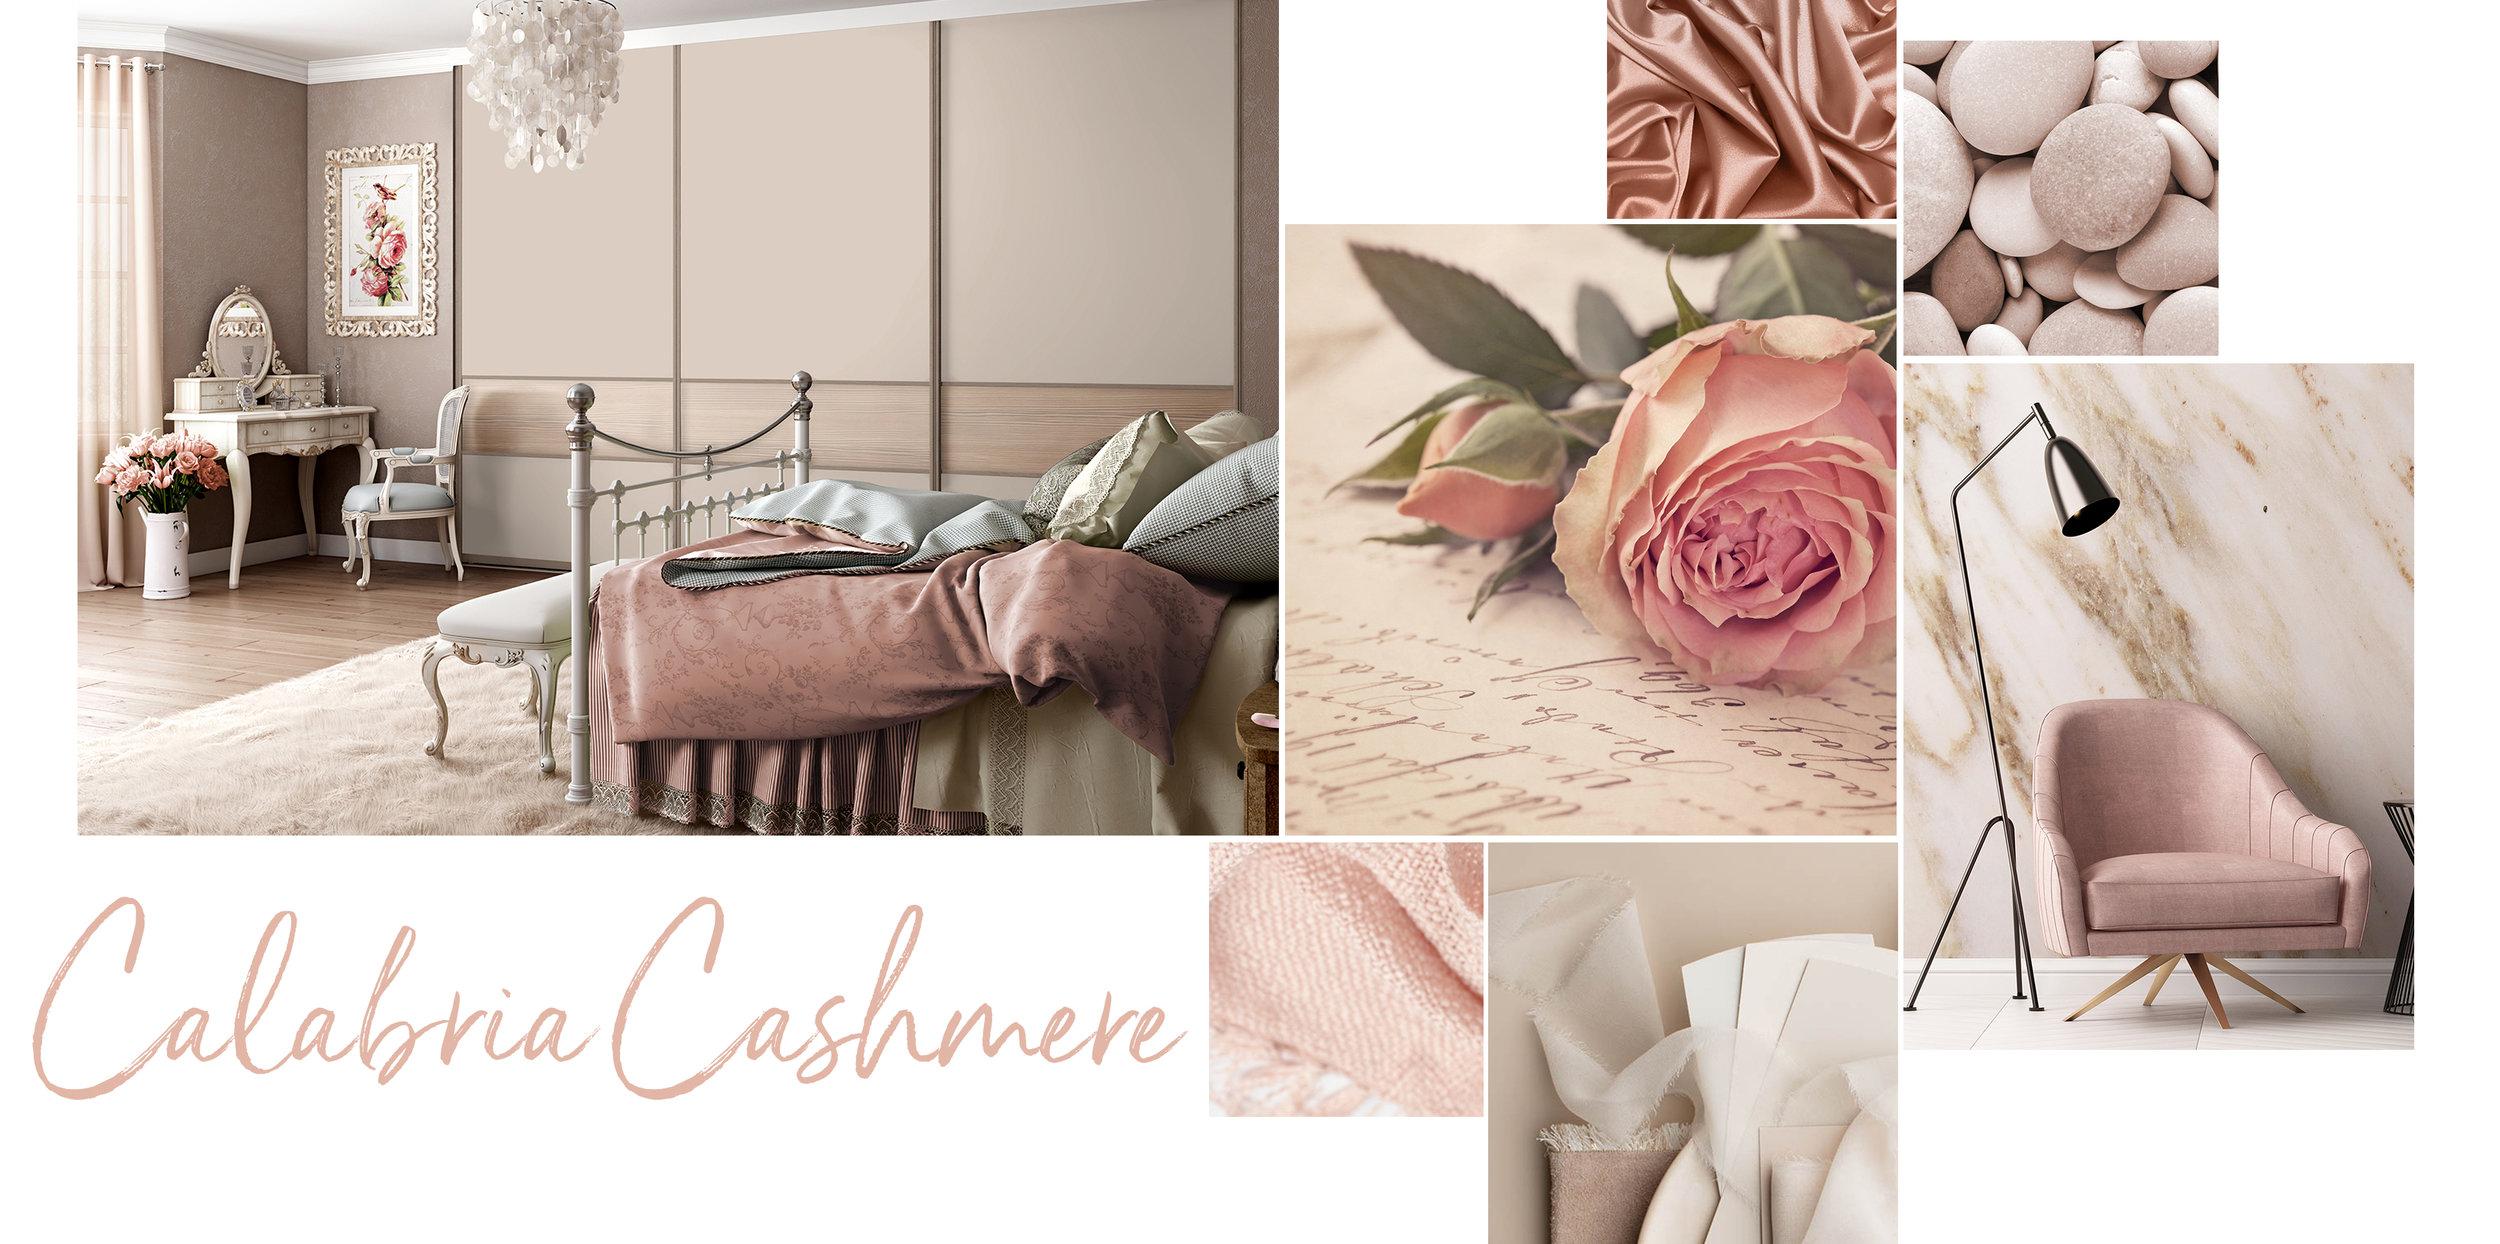 Calabria Cashmere moodboard.jpg